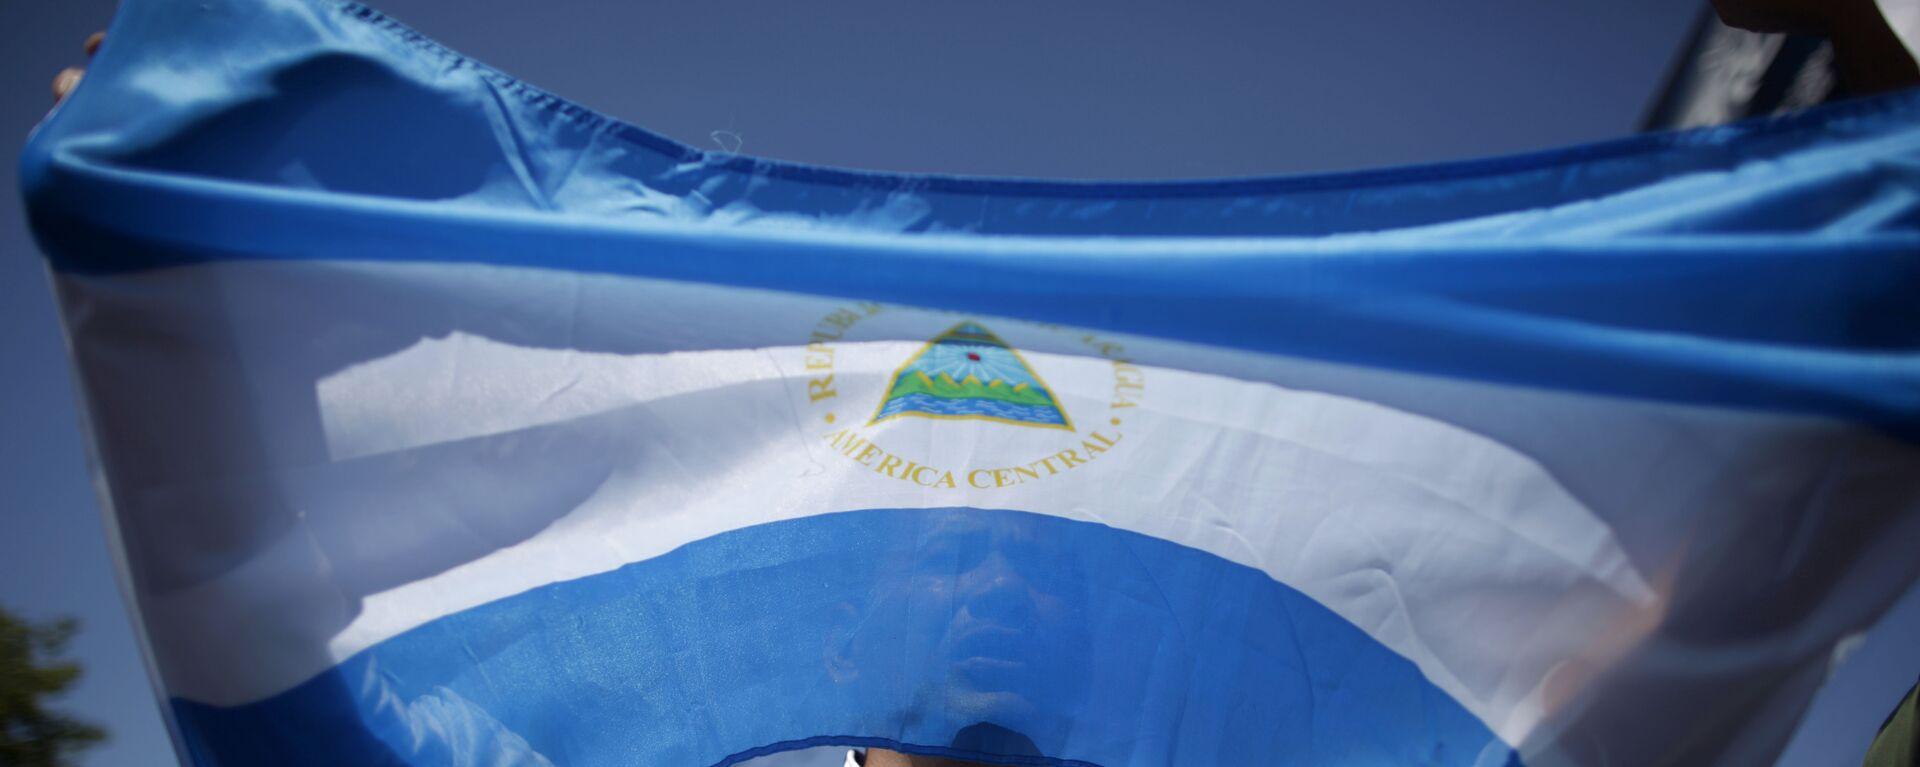 A man holds up a Nicaraguan flag during a demonstration against the presidential candidacy of Nicaragua's President Daniel Ortega in Managua, Nicaragua, Sunday, Feb 20, 2011.  - Sputnik Mundo, 1920, 23.07.2021